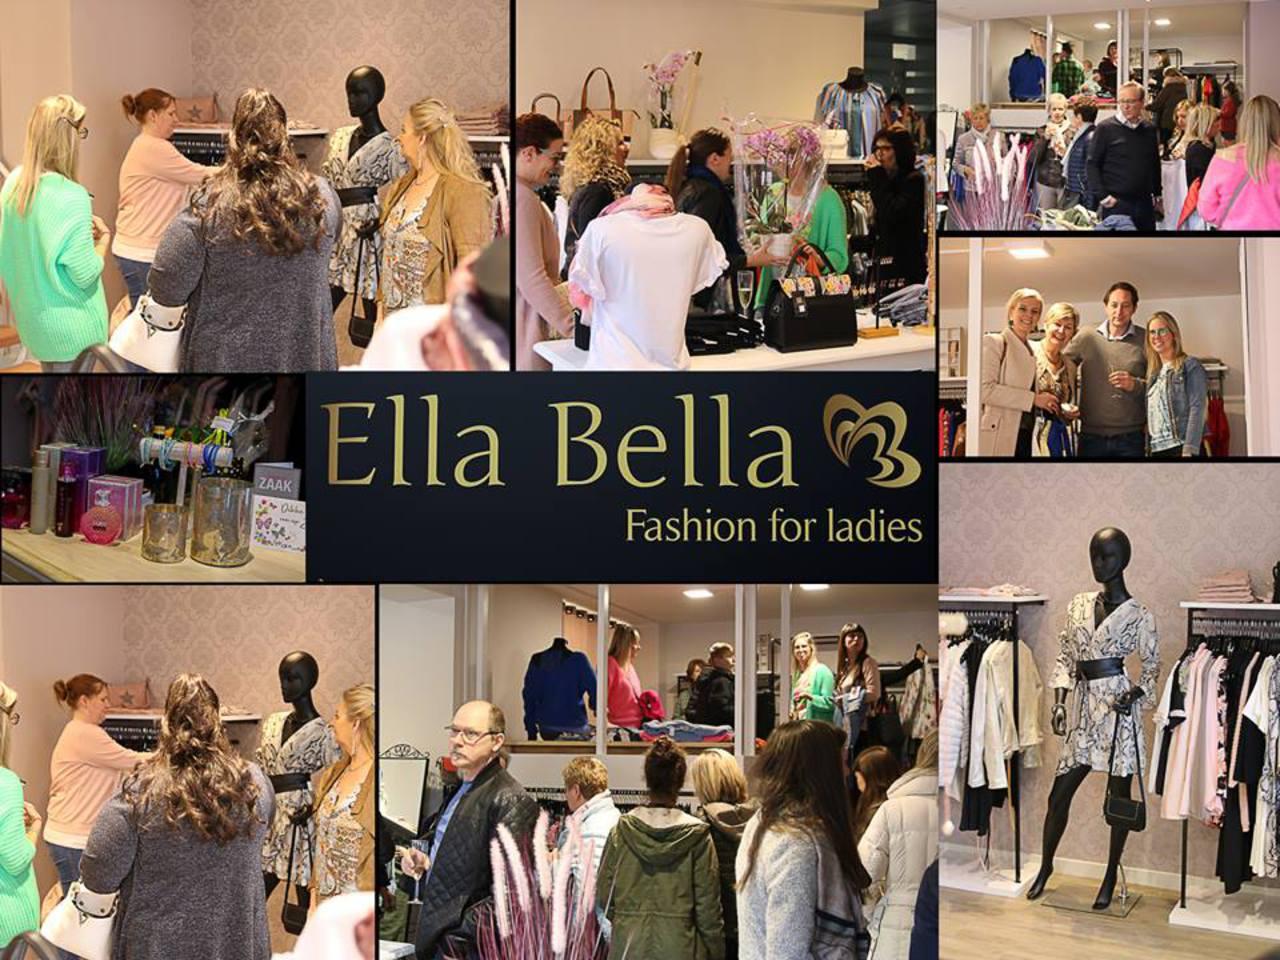 Dames Kleding Winkel.Opening Dames Kledingwinkel Ella Bella Shopping Bolderberg 23 24